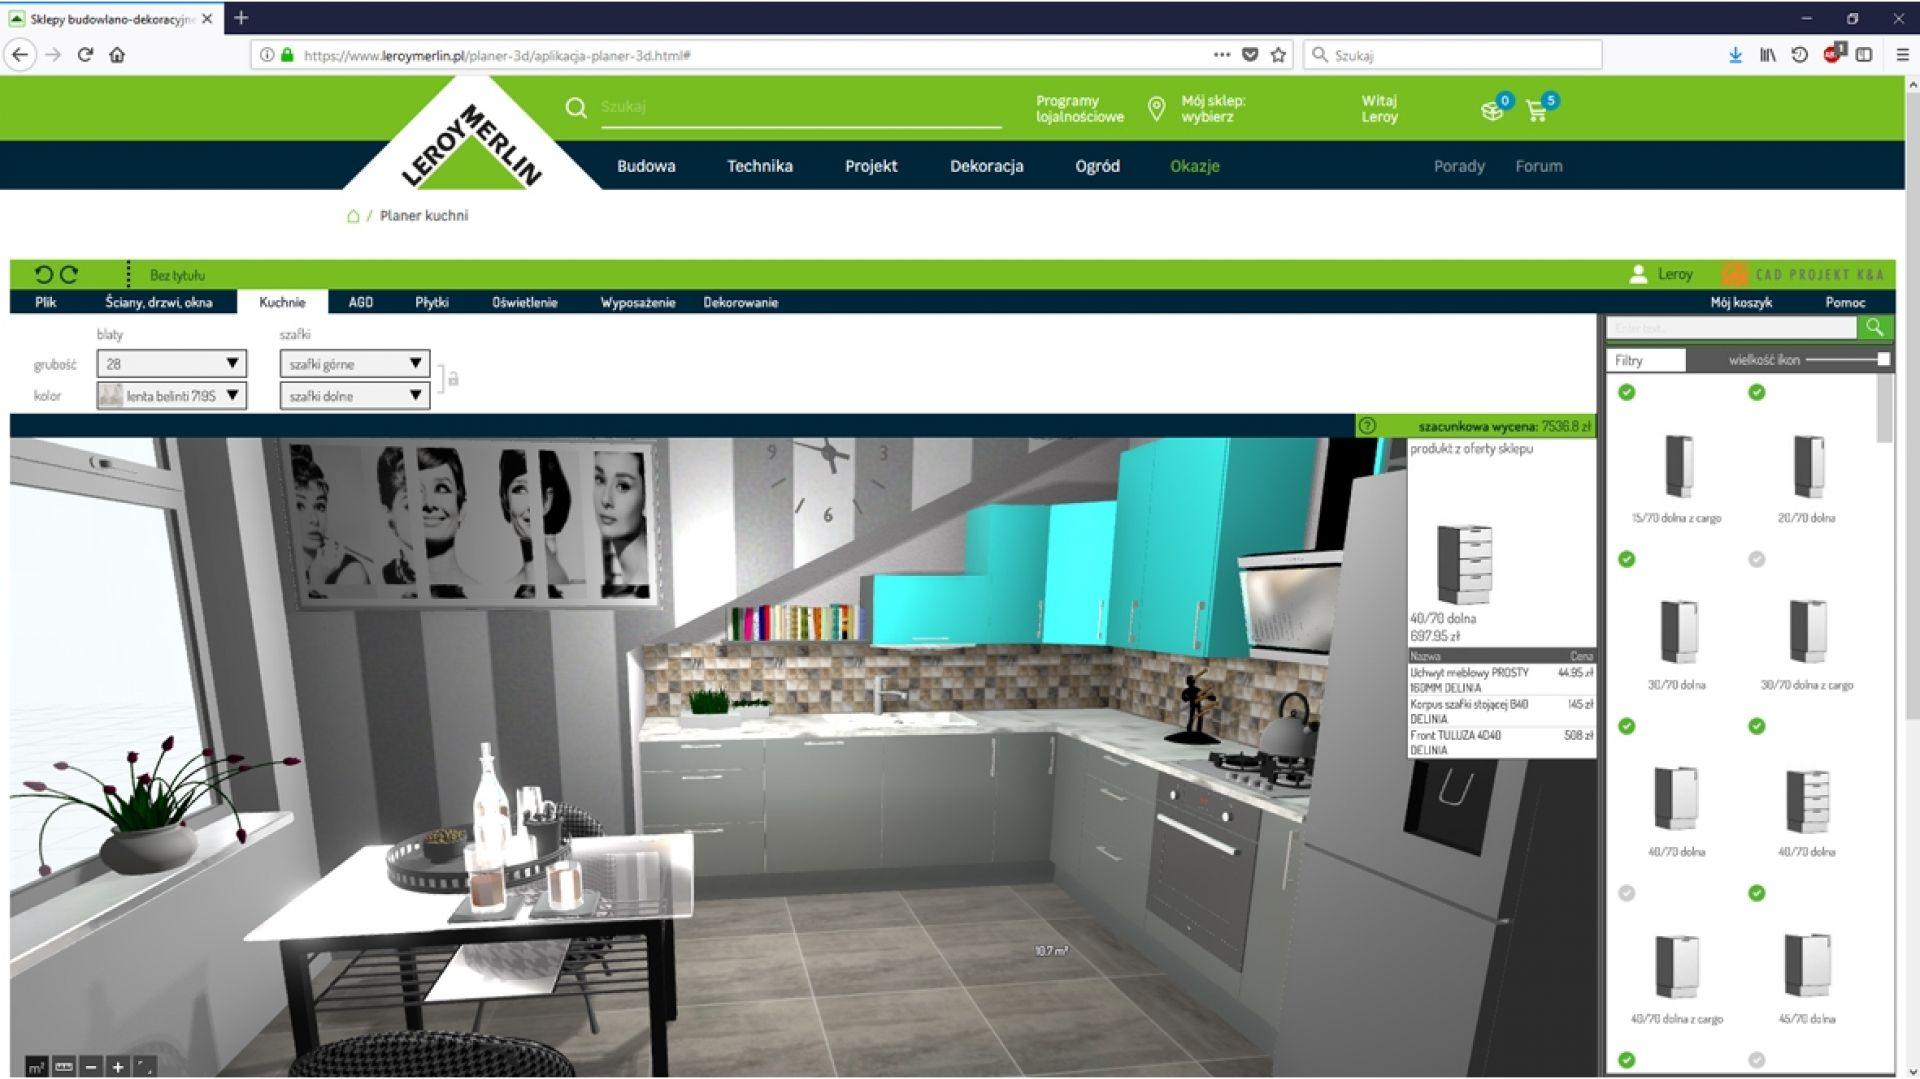 Leroy Merlin Planer 3D/CAD Projekt K&A. Produkt zgłoszony do konkursu Dobry Design 2019.